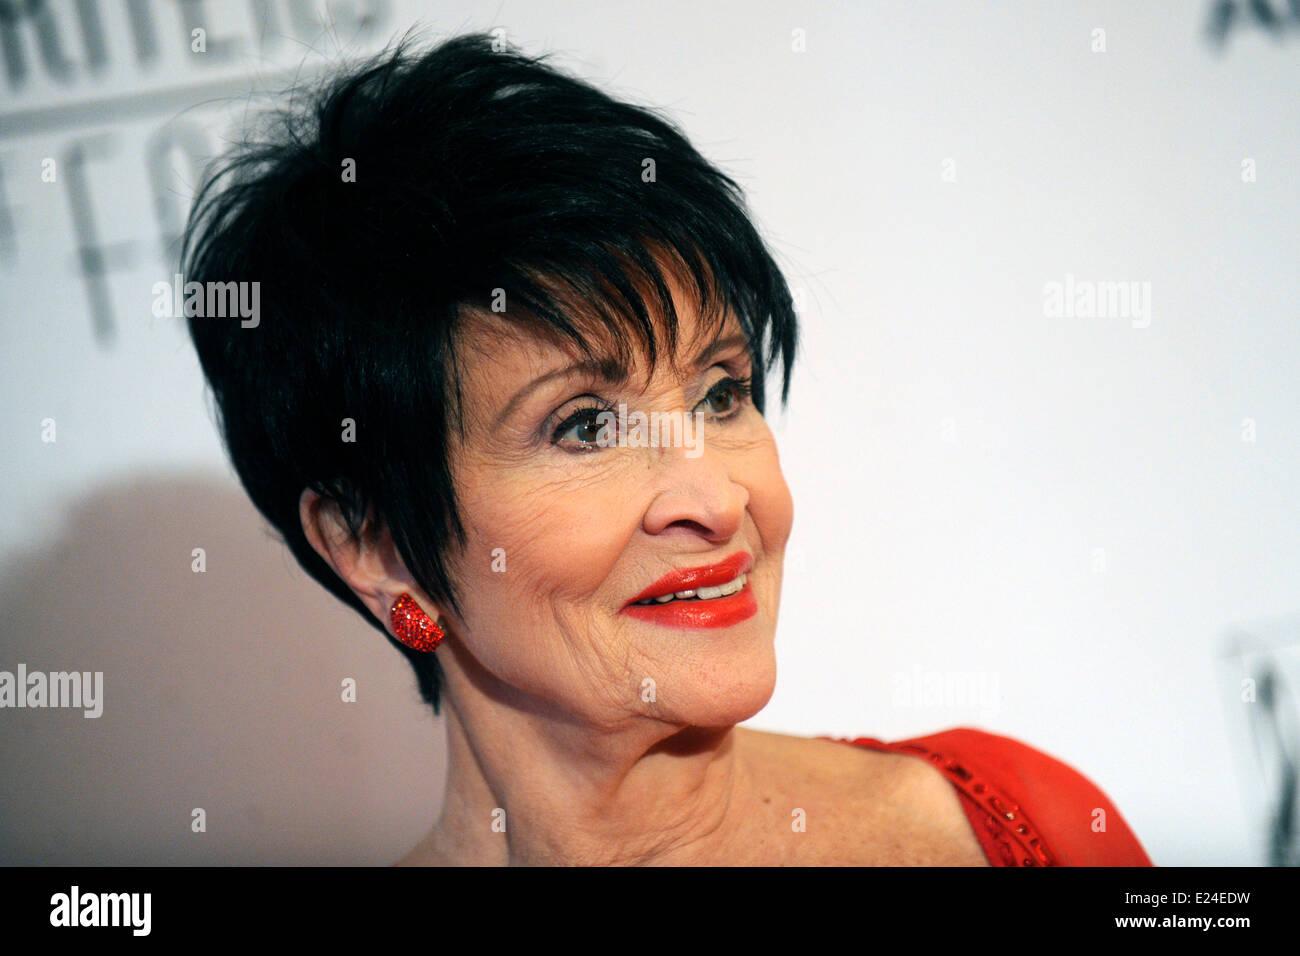 Watch Gwen Zamora (b. 1990) video